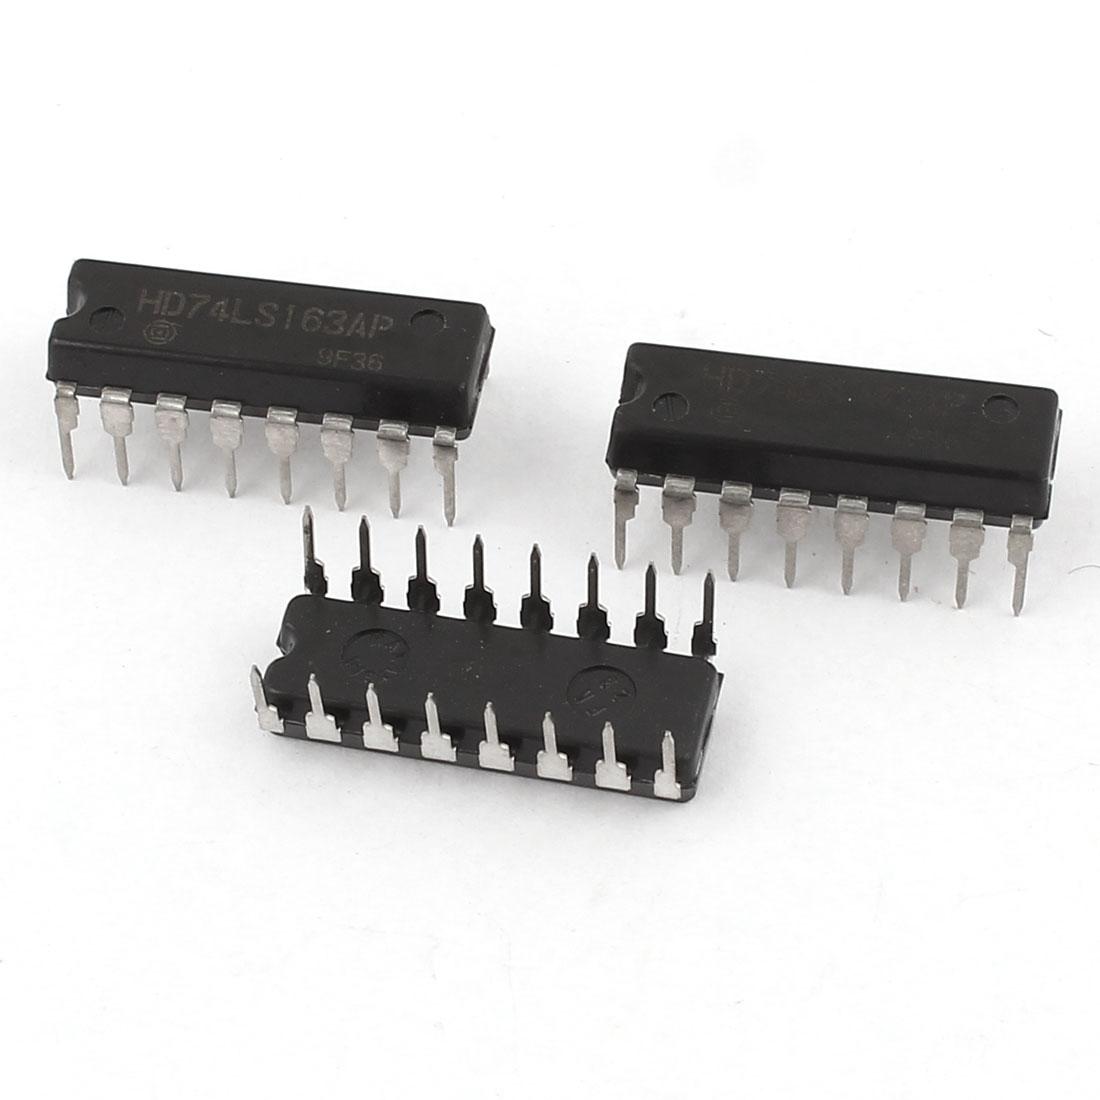 3pcs HD74LS163AP Synchronous 4-Bit Binary Counter DIP 16Pins IC